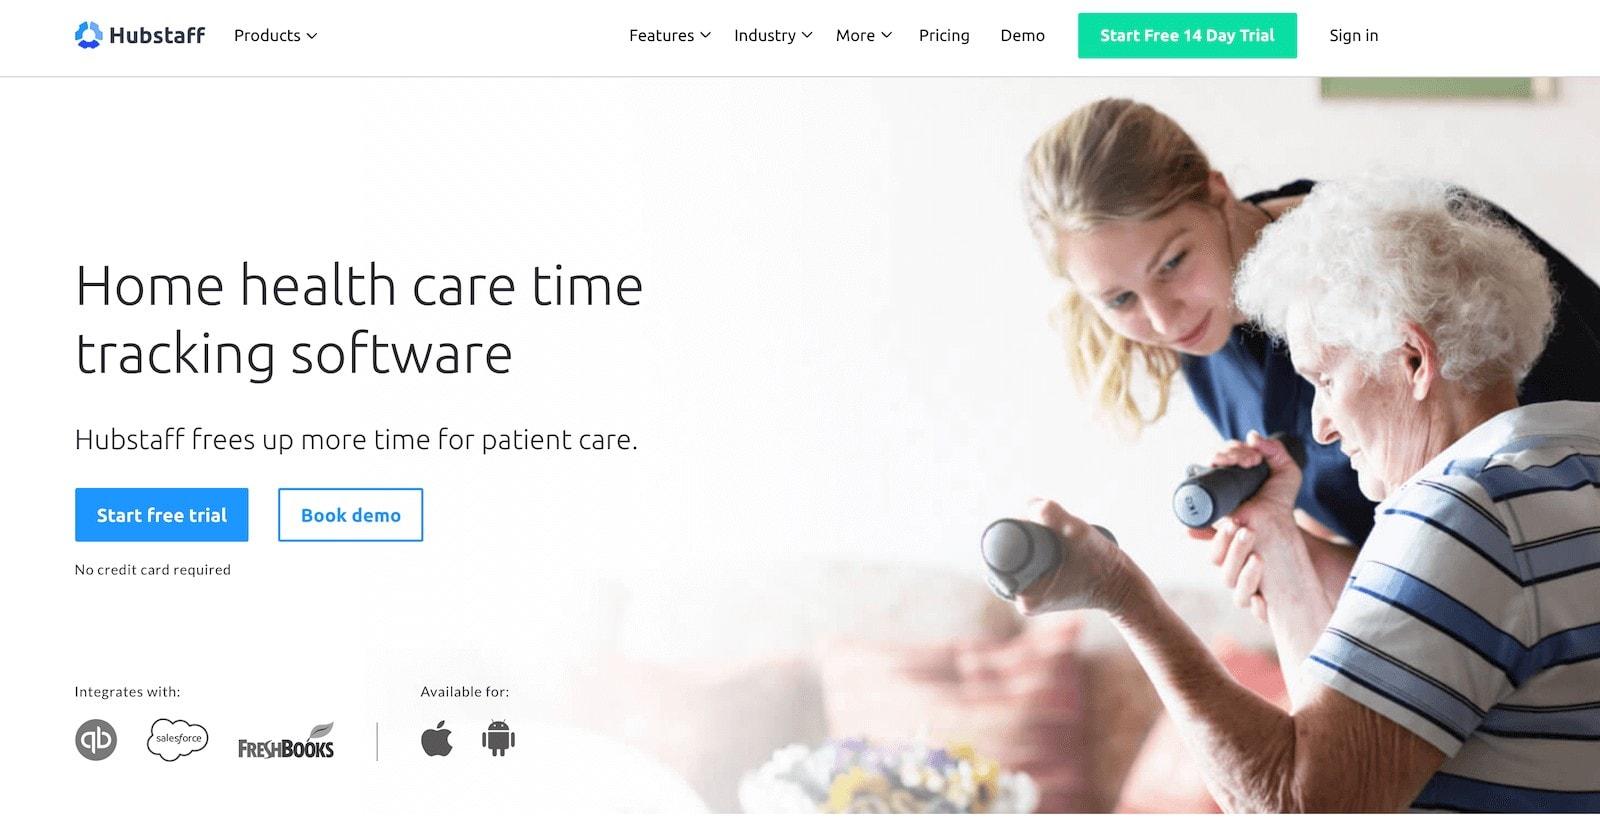 hubstaff home health care software